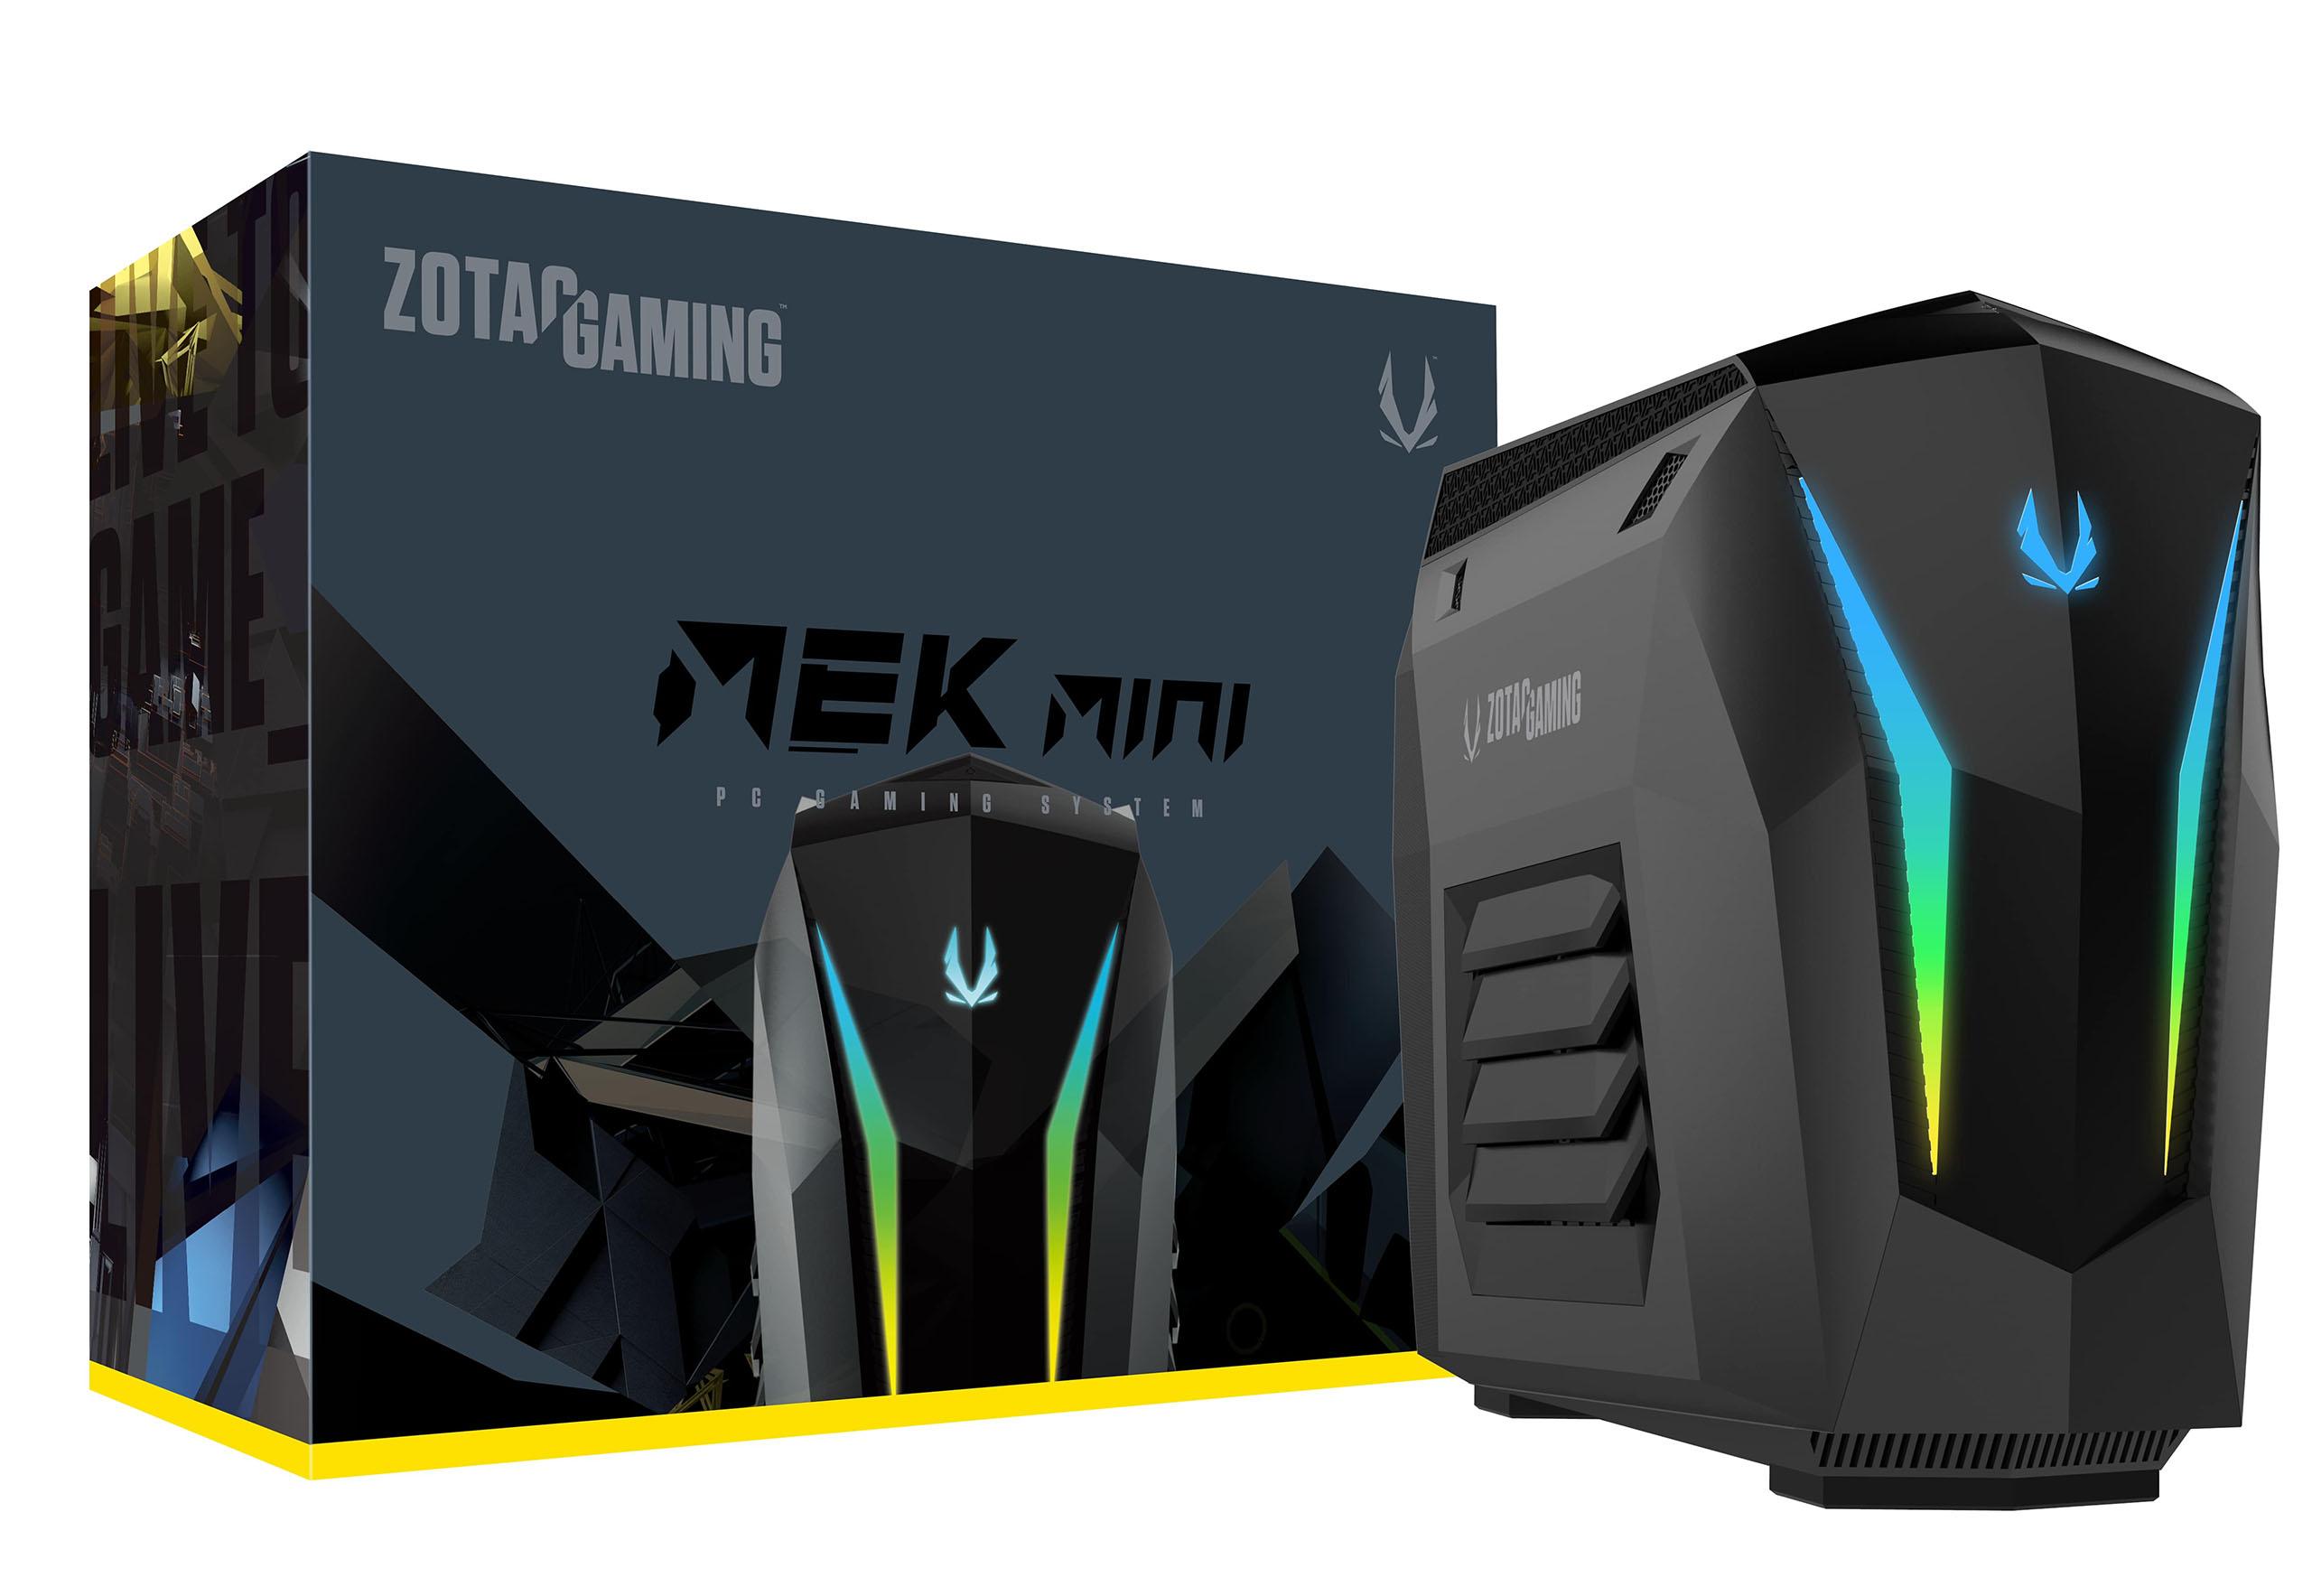 ZOTAC MEK MINI GAMING PC SUPER